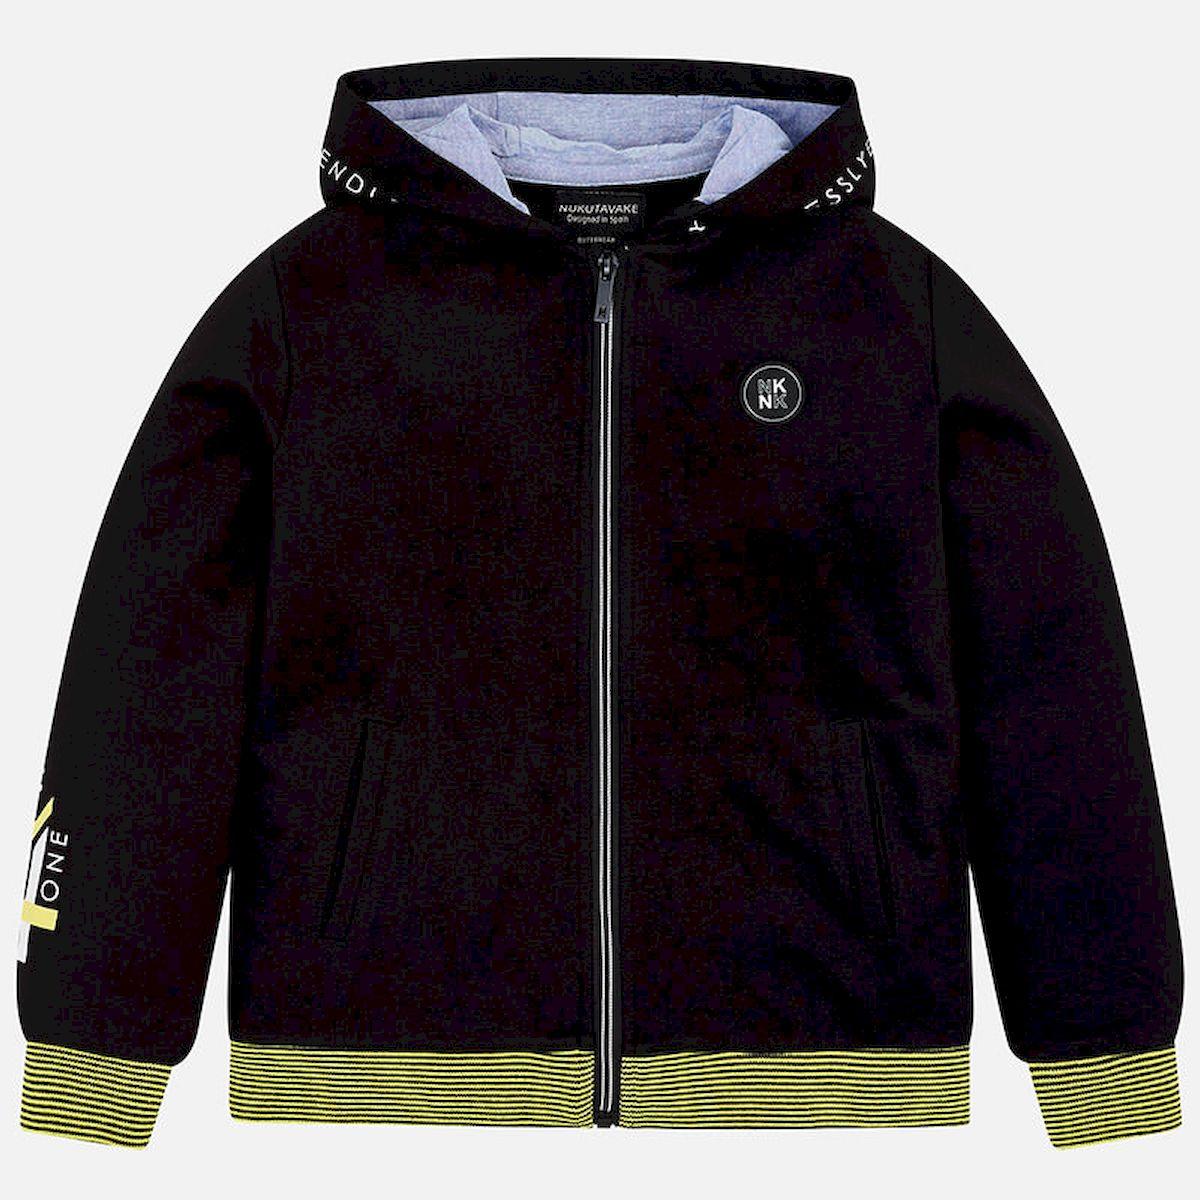 Куртка Nukutavake by Mayoral, Mayoral куртка для мальчика nukutavake by mayoral цвет темно синий 6429 78 7a размер 160 14 лет